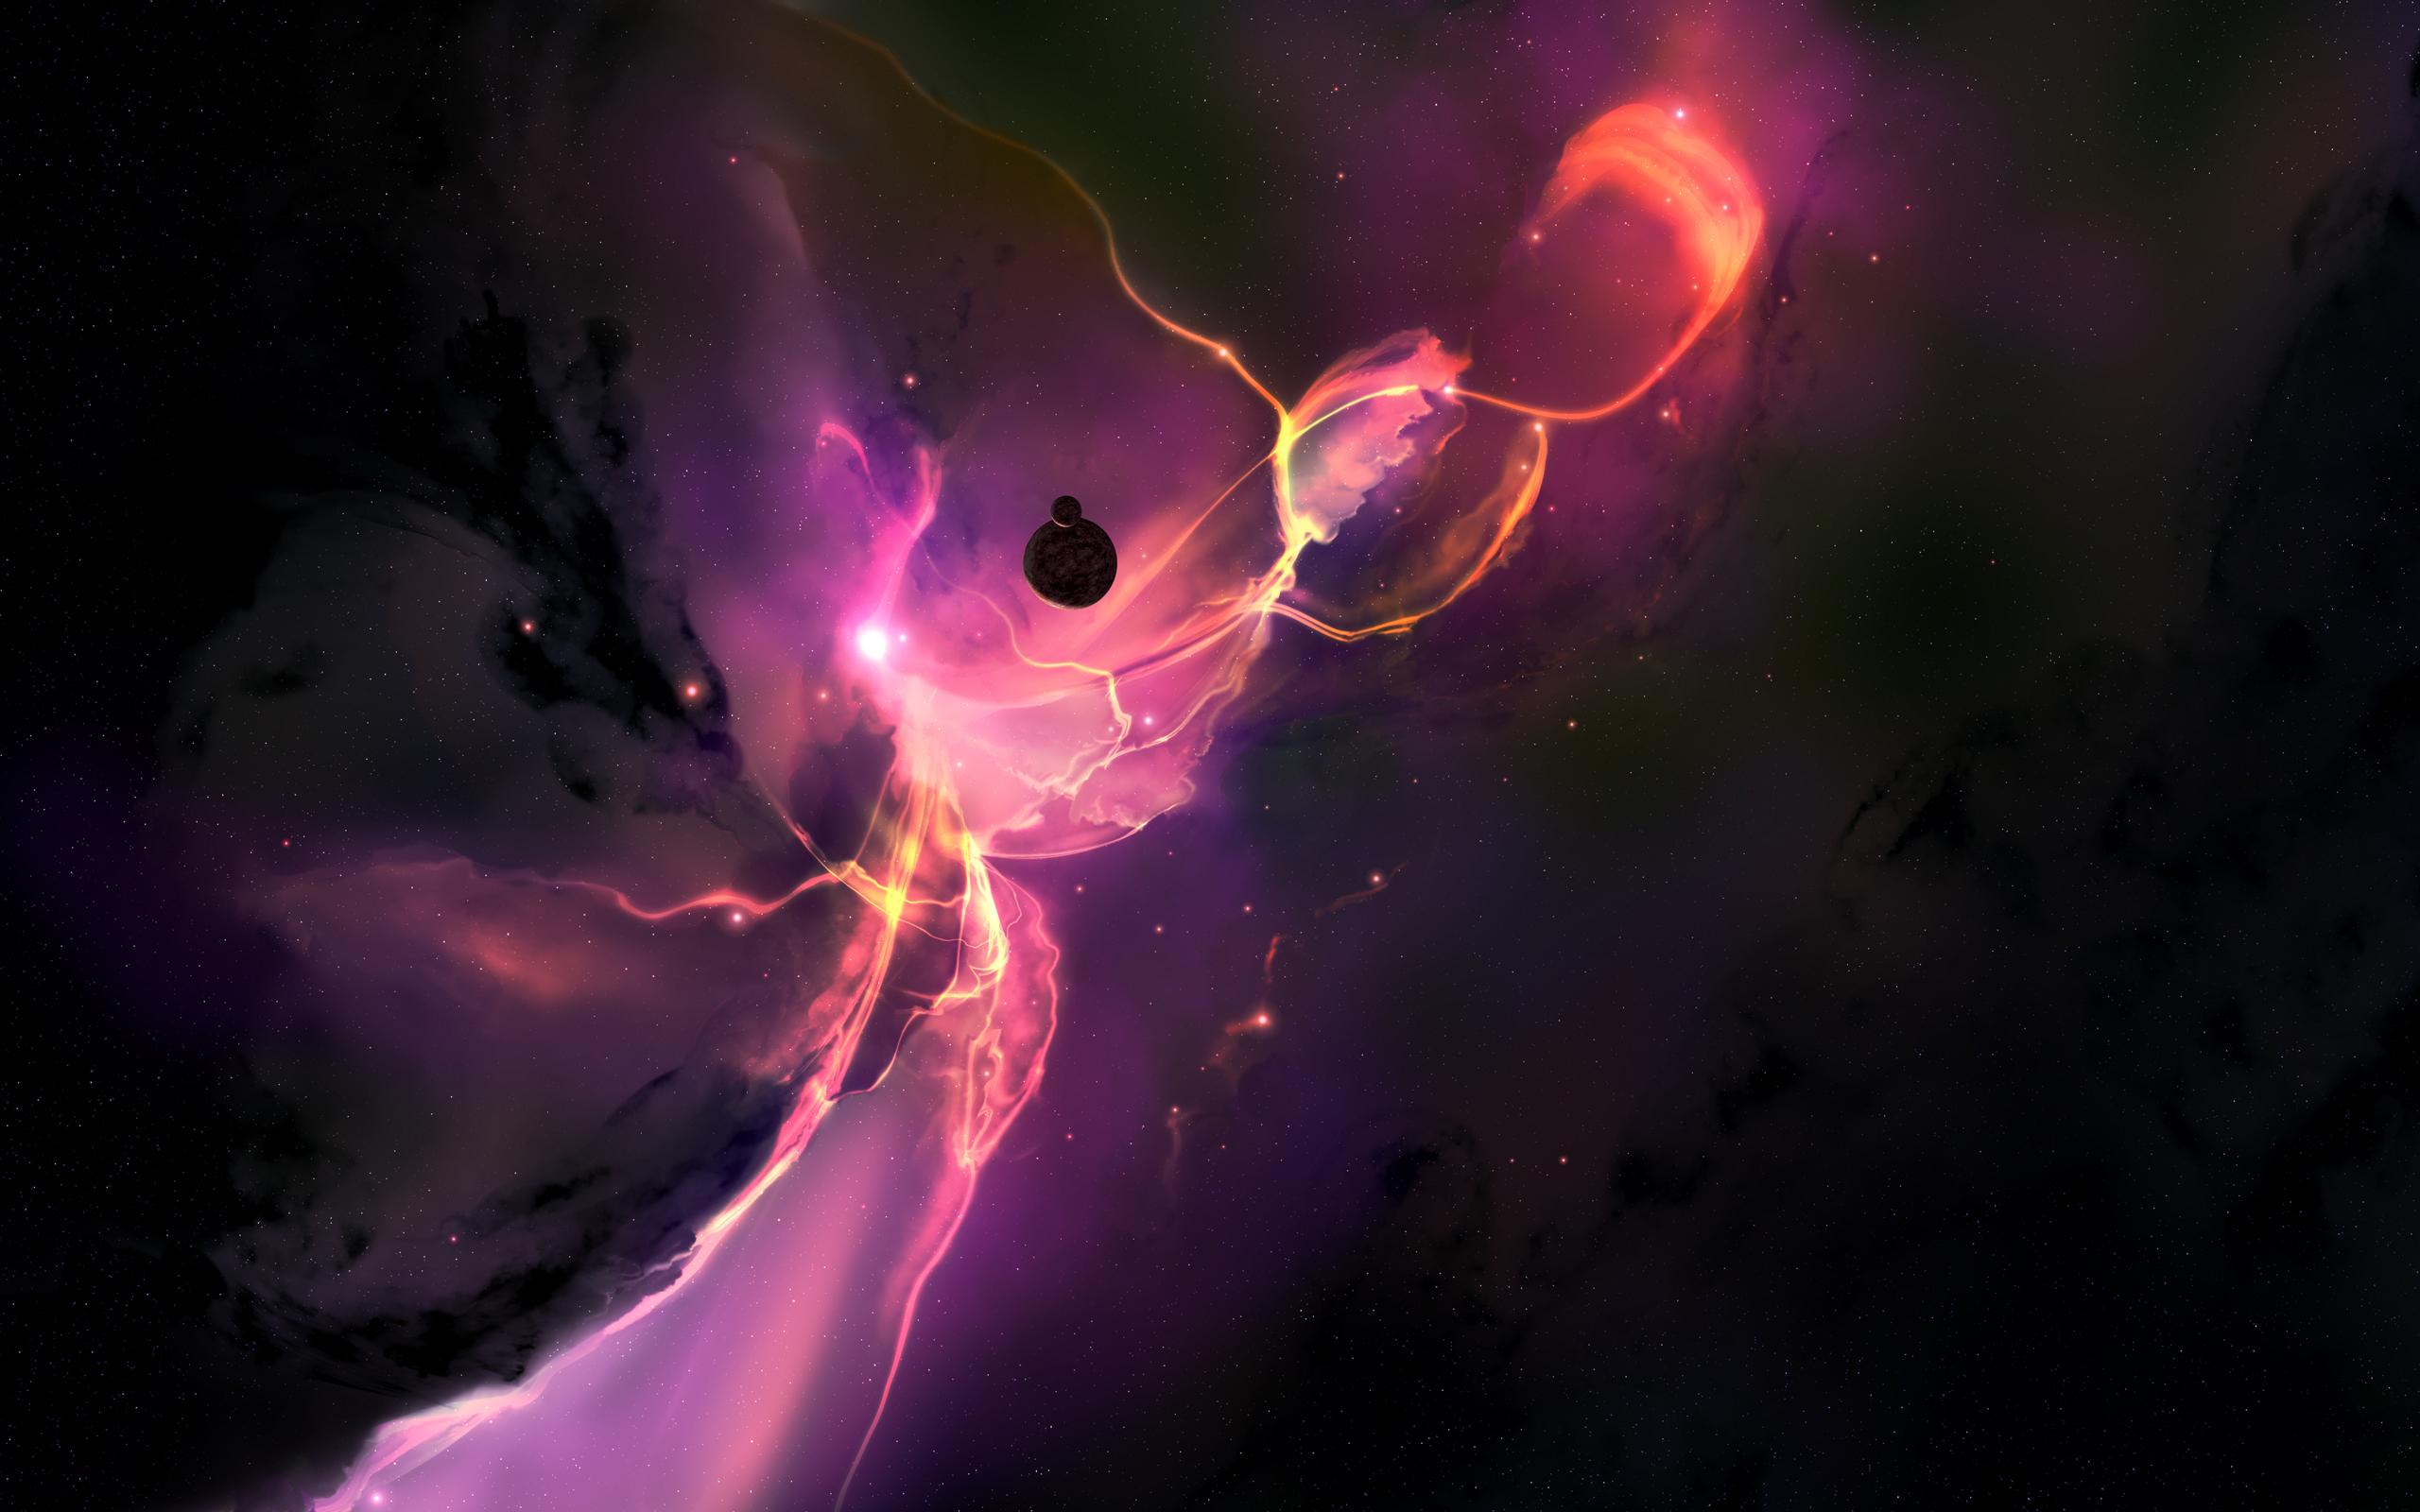 purple-space-artwork